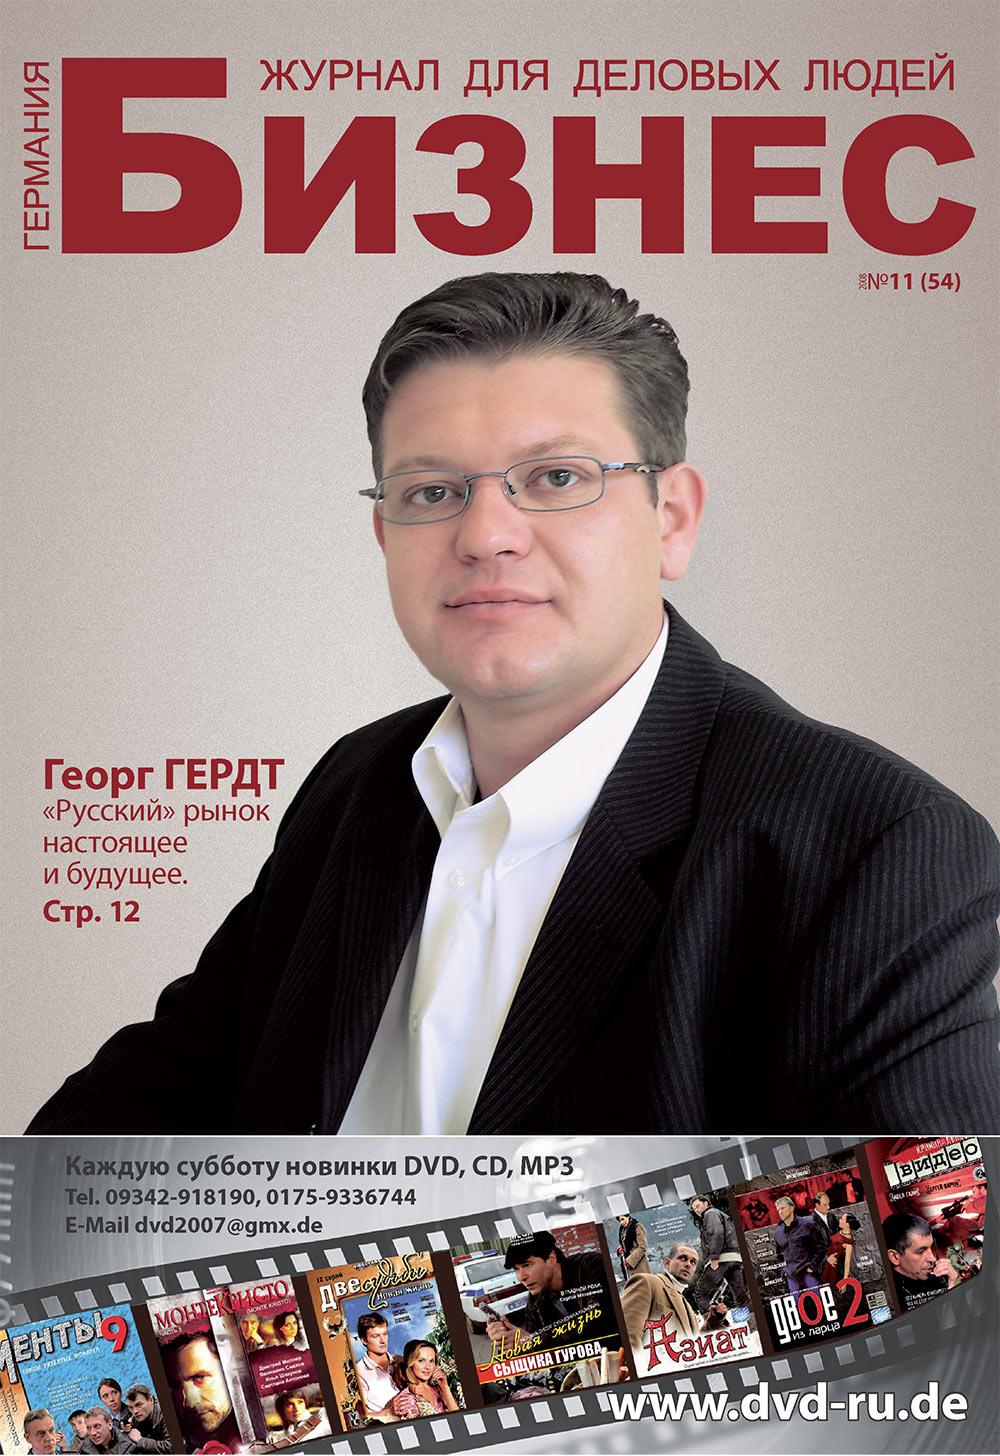 Бизнес (журнал). 2008 год, номер 11, стр. 1